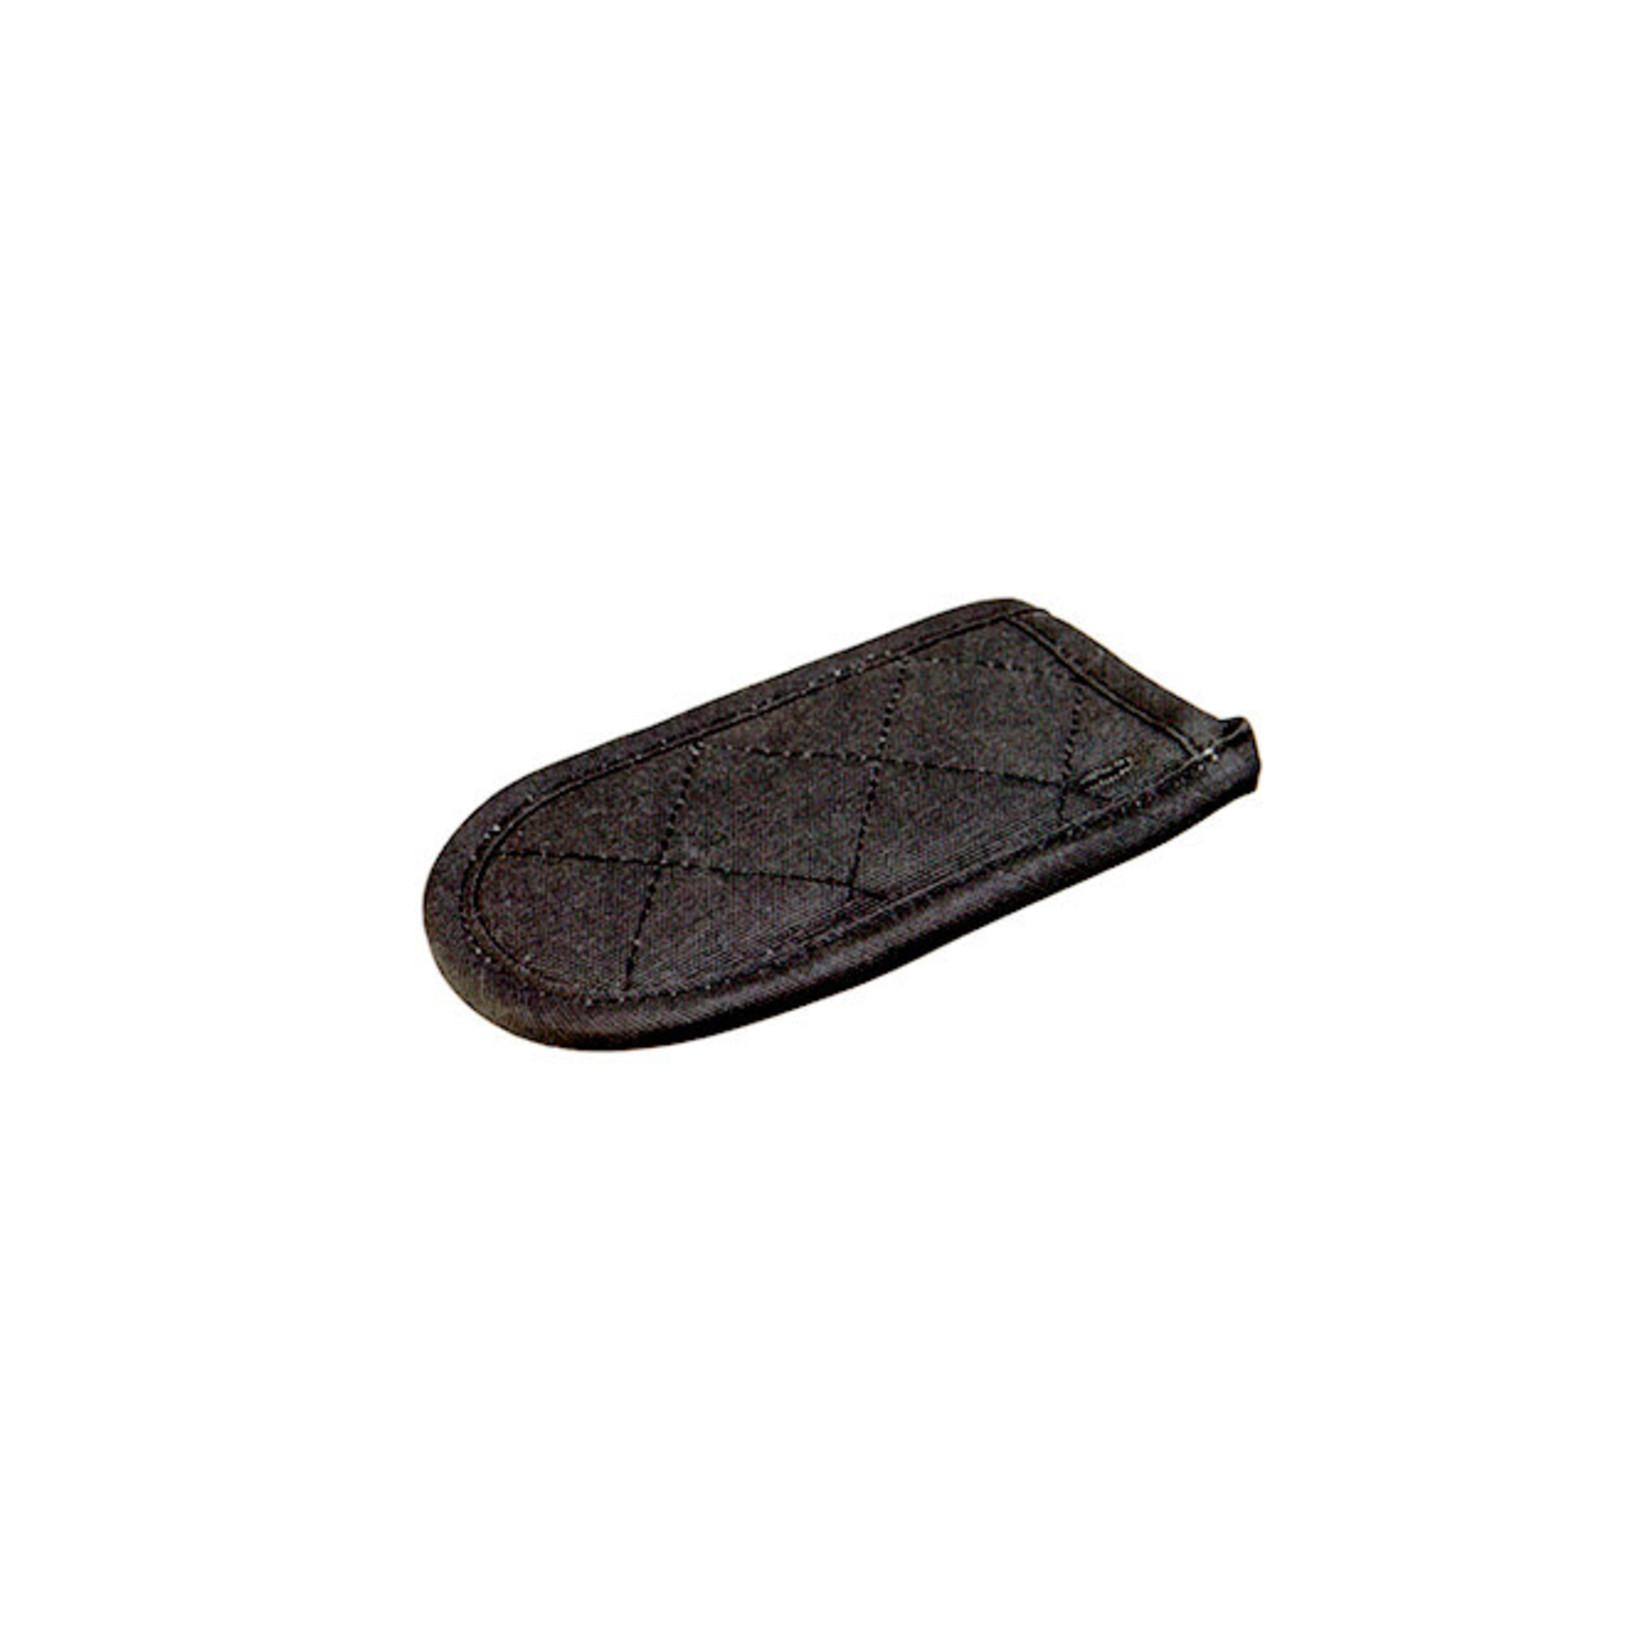 Lodge Handle Holder Fabric Black